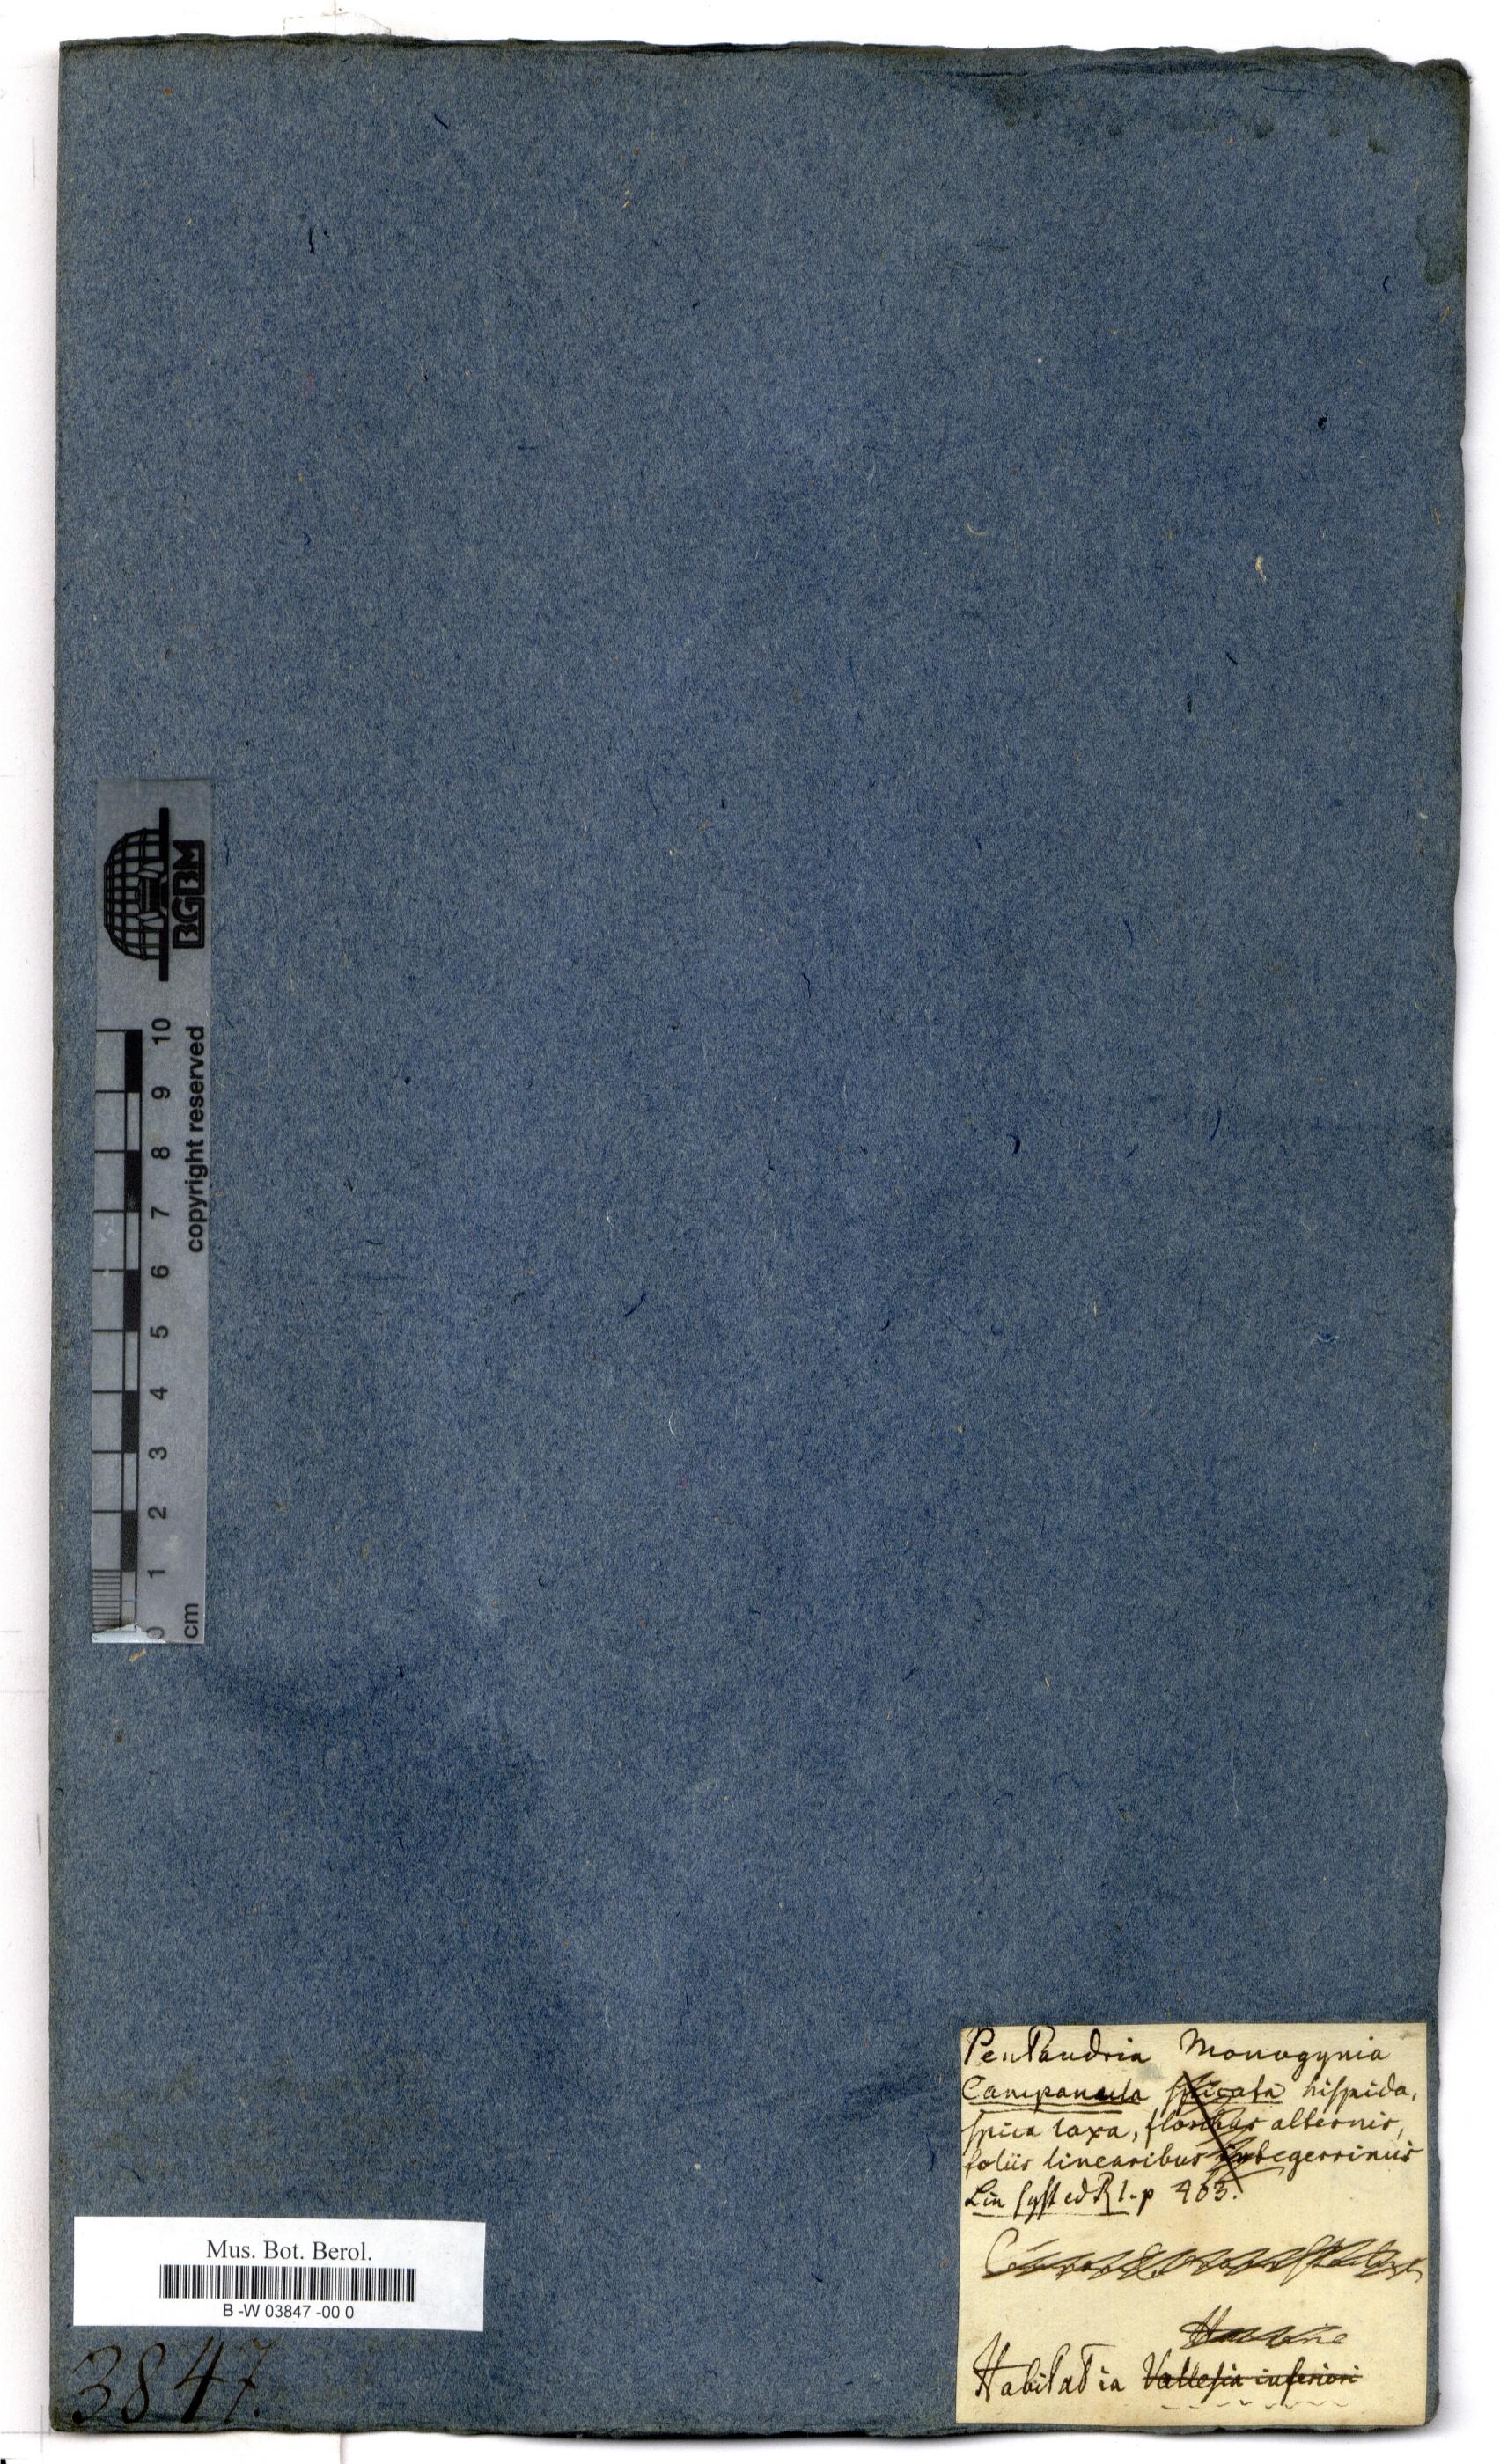 http://ww2.bgbm.org/herbarium/images/B/-W/03/84/B_-W_03847%20-00%200__3.jpg